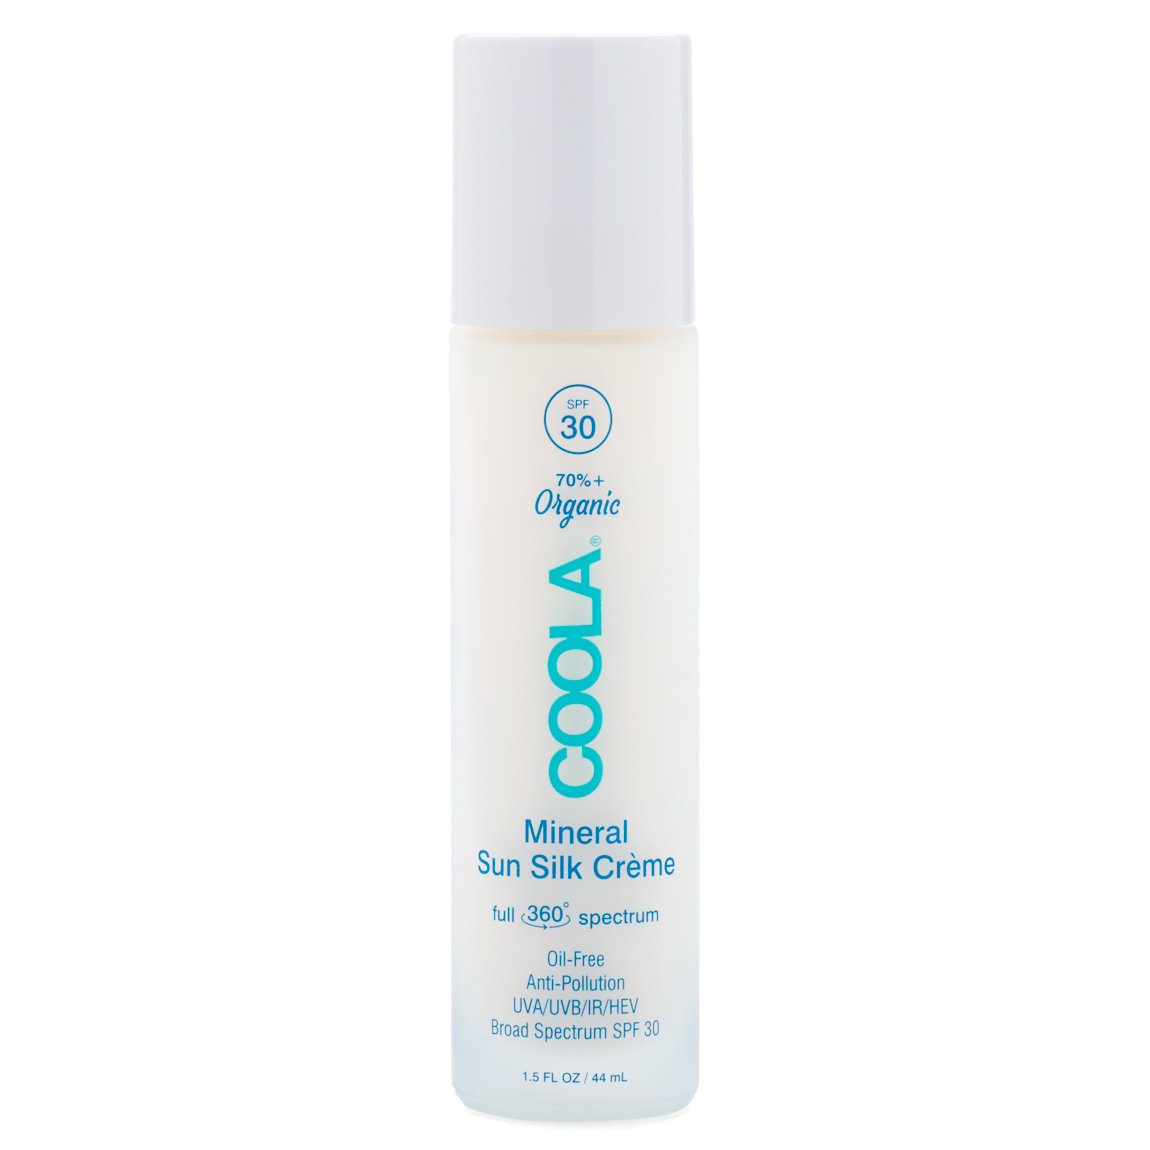 COOLA Mineral Organic Sun Silk Creme SPF 30 product swatch.